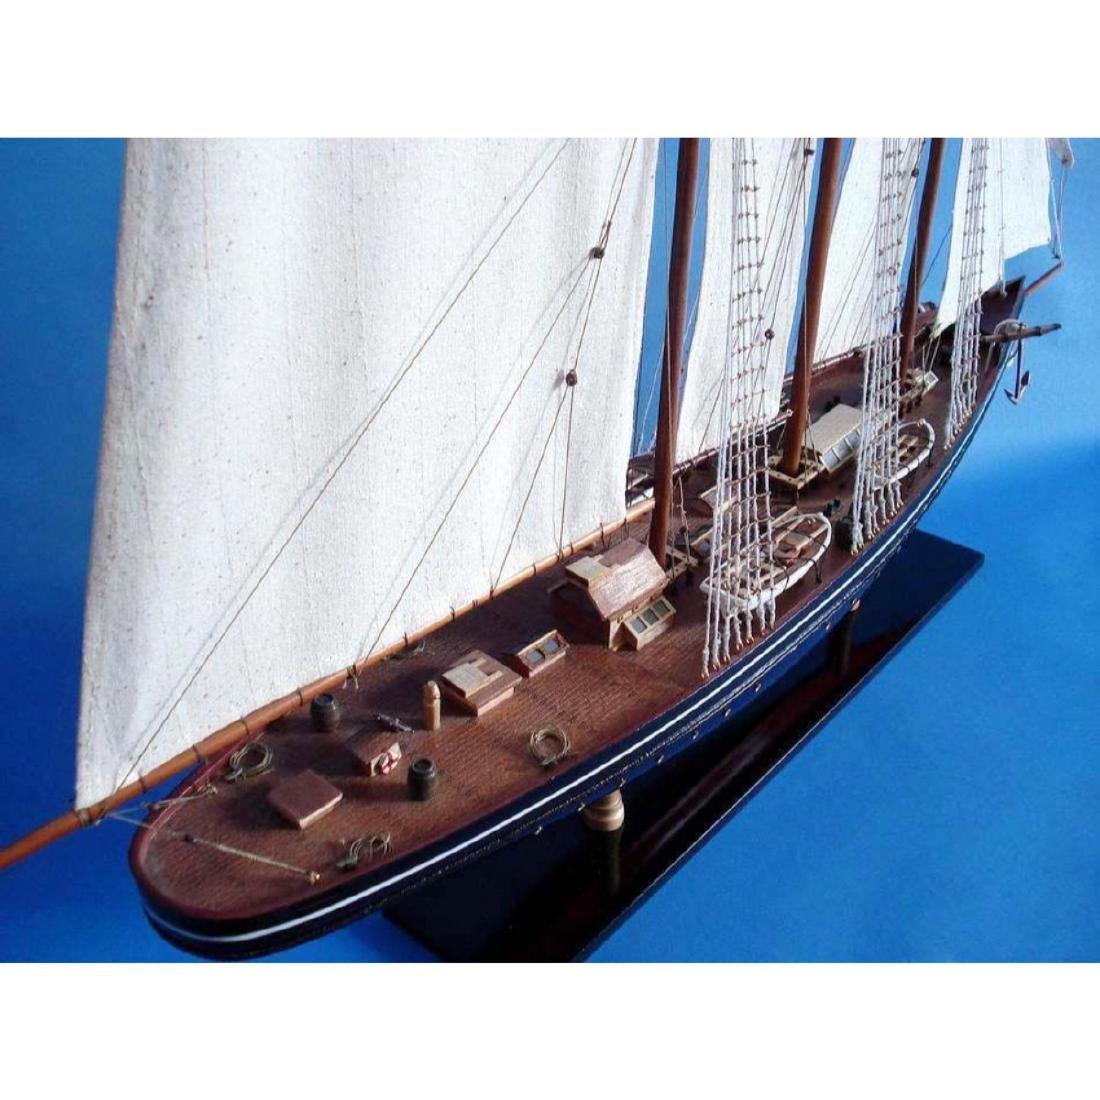 "Wooden Atlantic Limited Model Sailboat 32"" - 5"